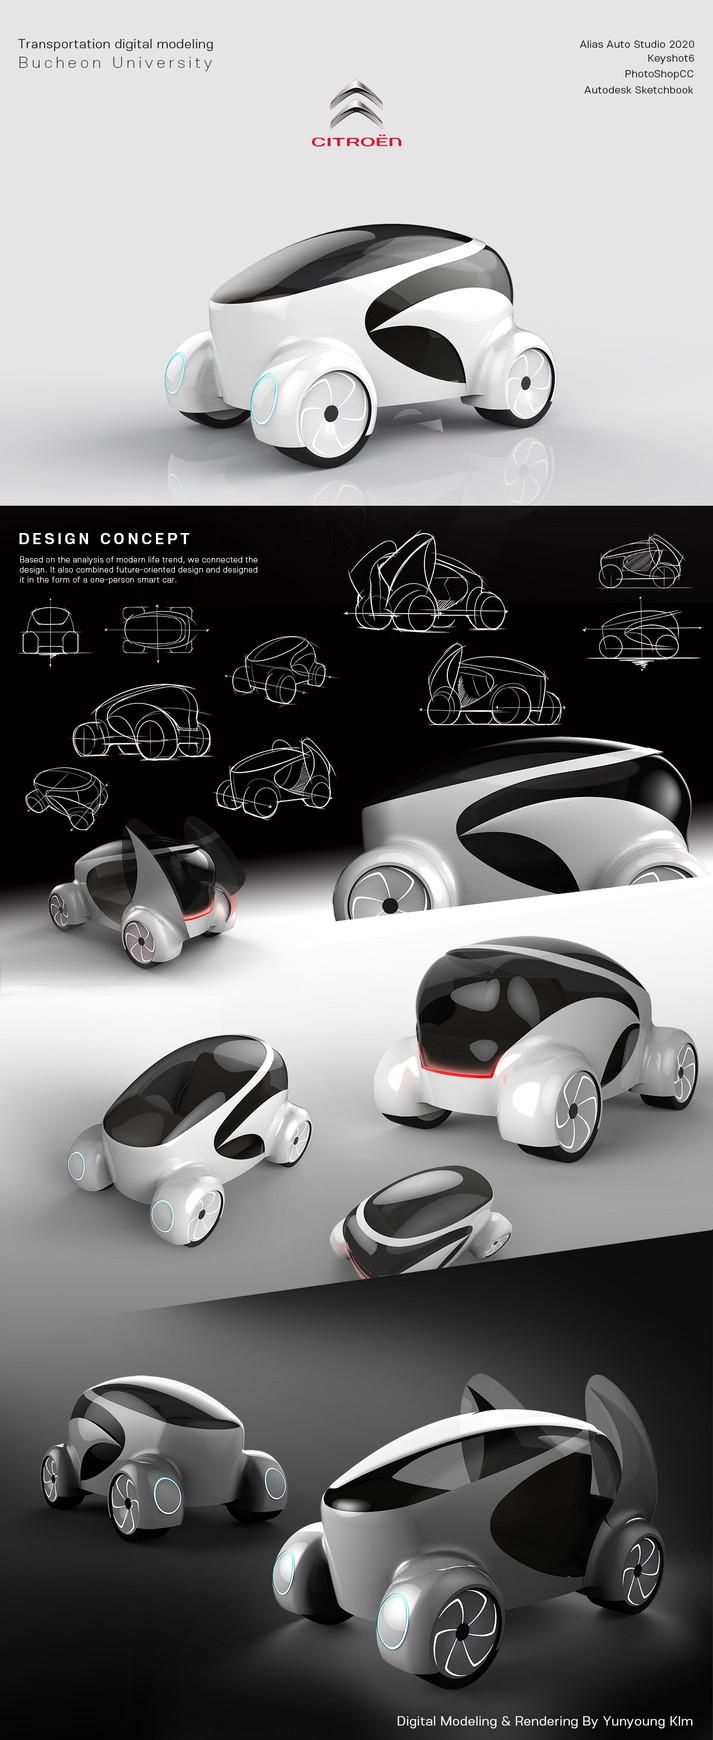 Personal futuristic smart car